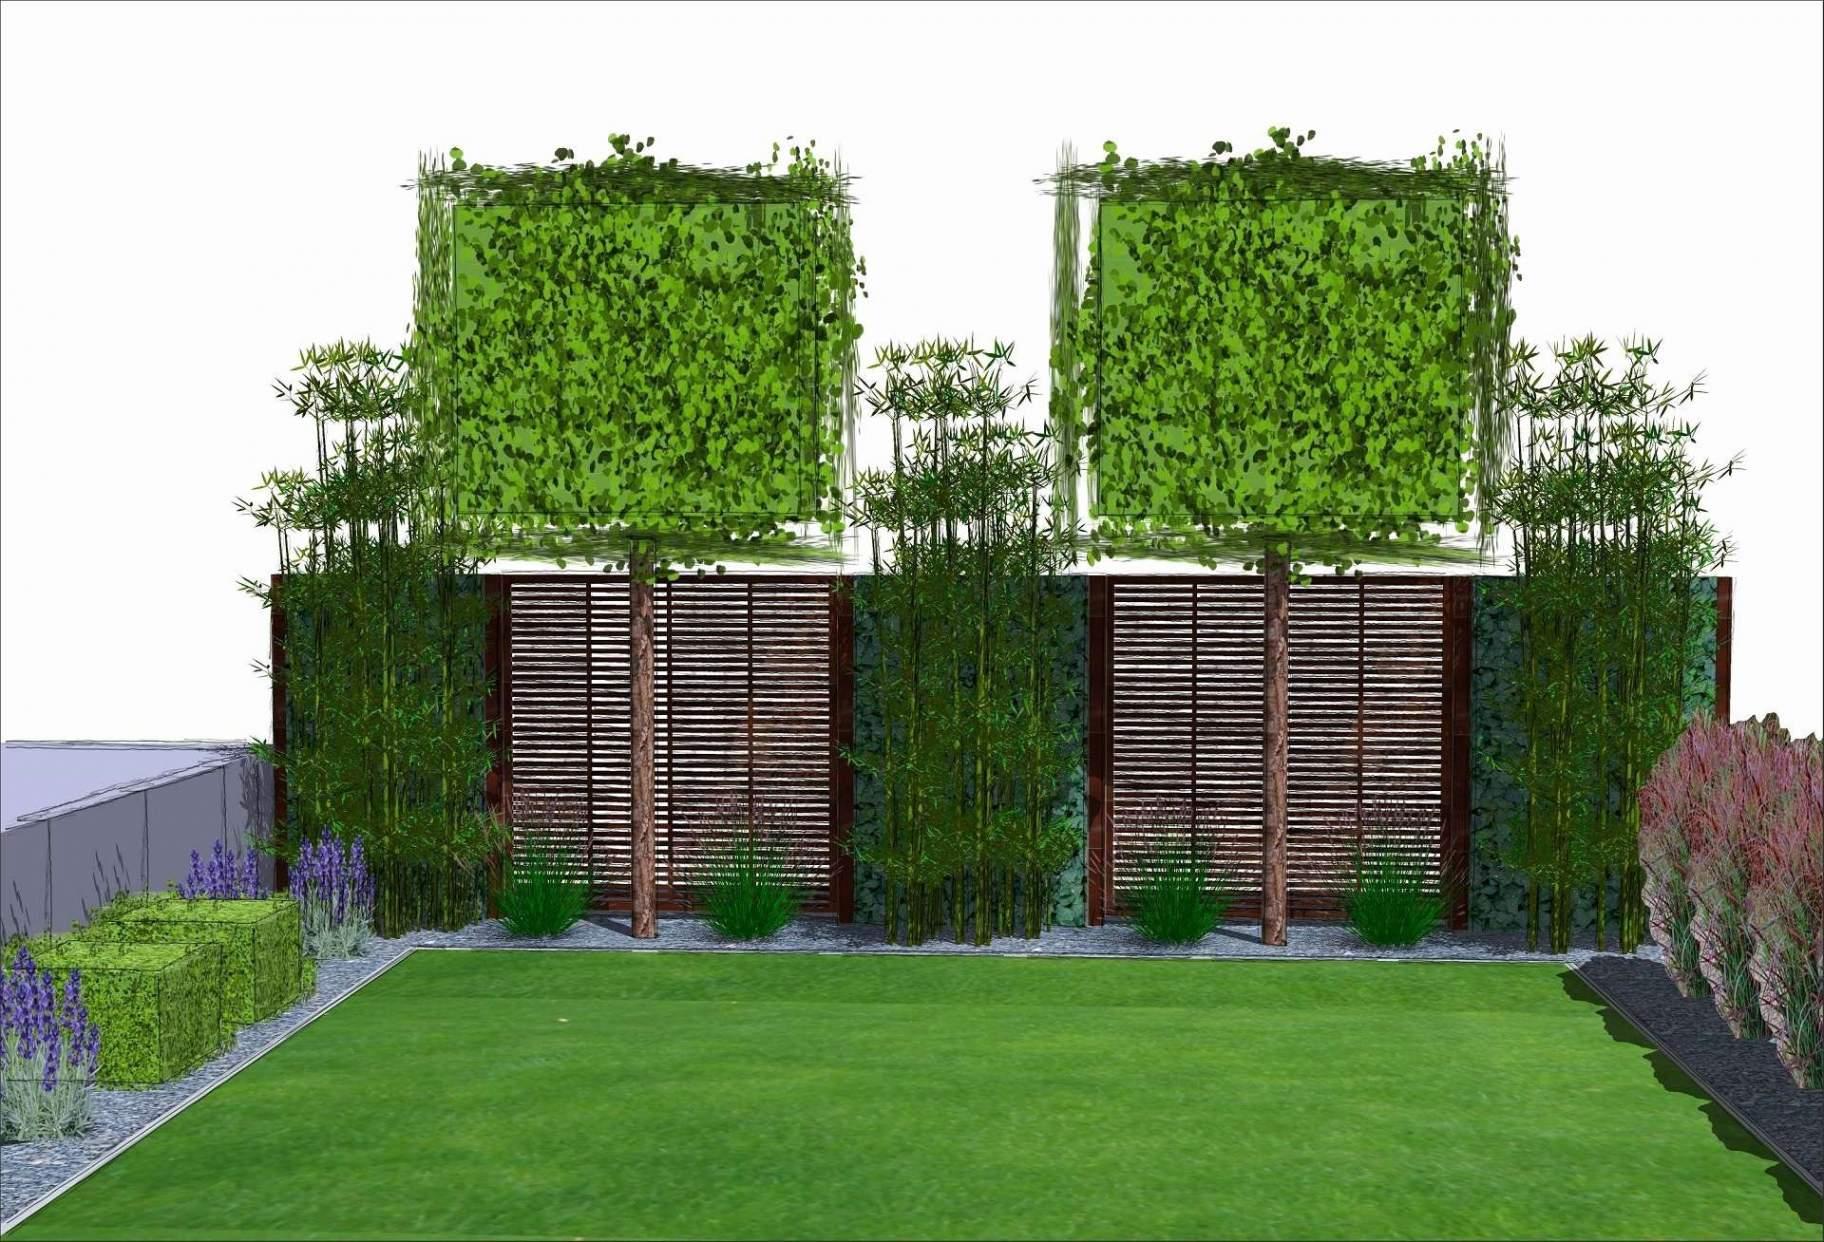 garten pflanzen sichtschutz genial garten pflanzen gartenpflanzen 0d garten pflanzen sichtschutz garten pflanzen sichtschutz